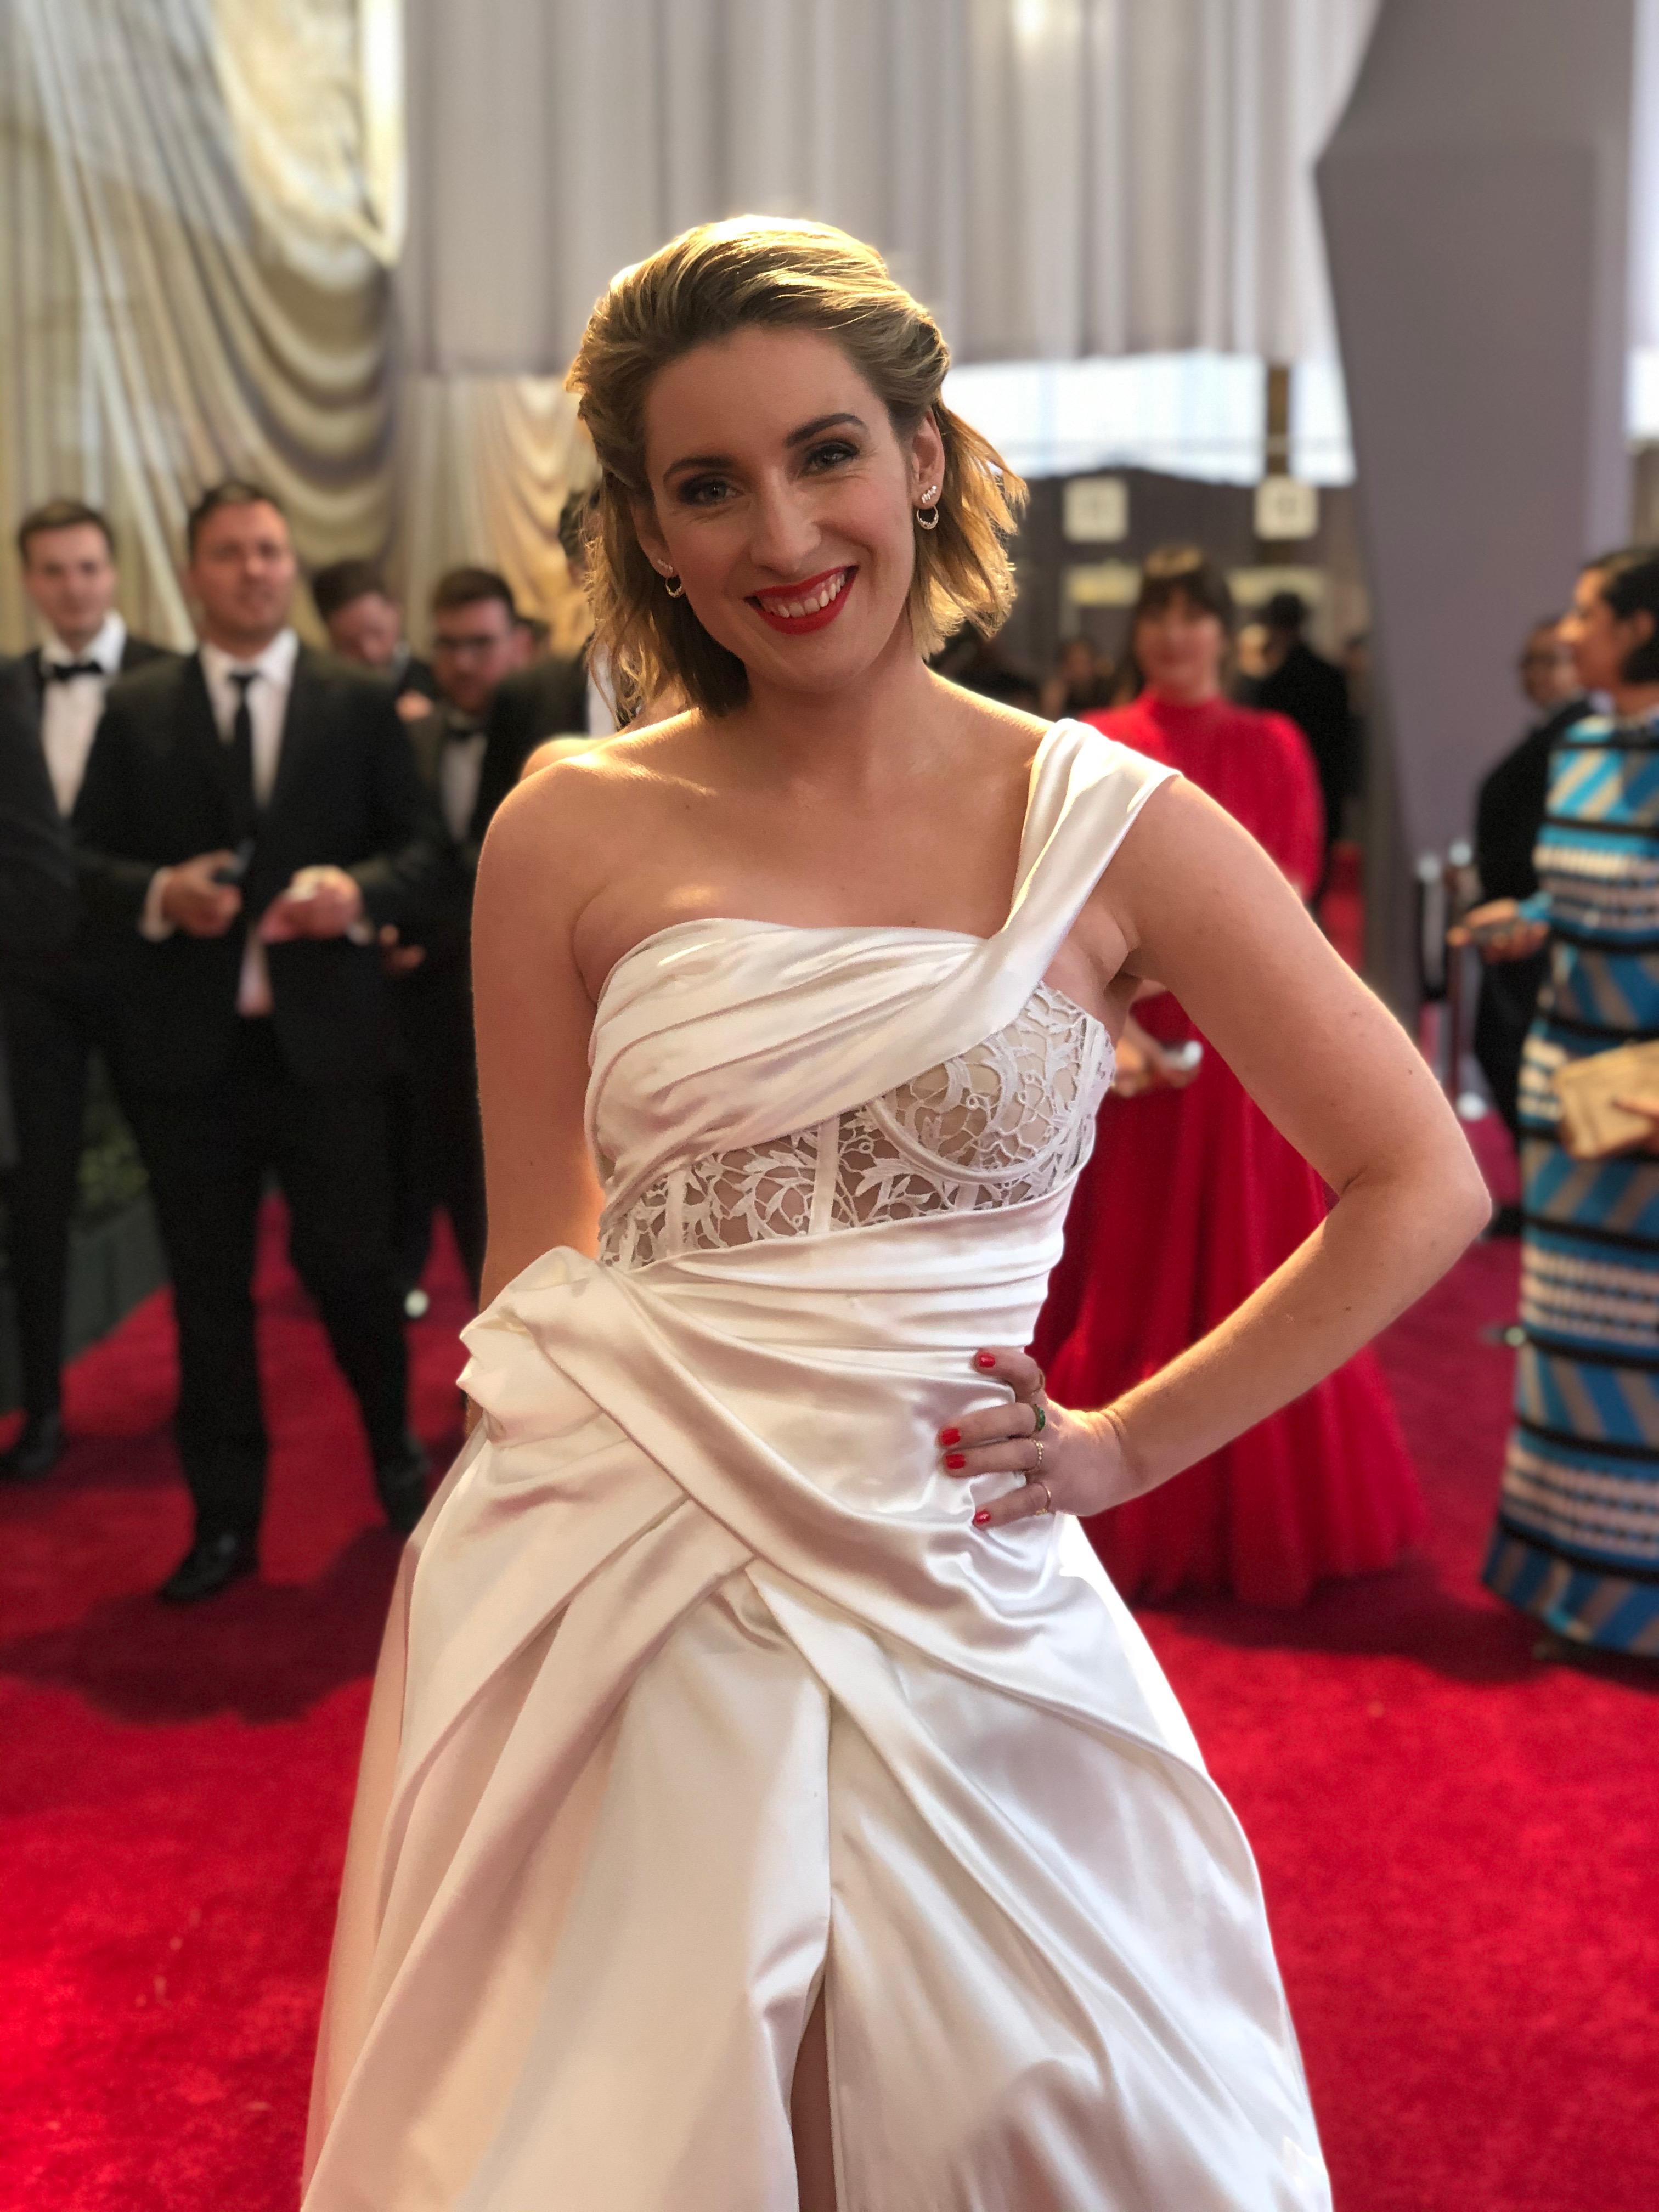 92nd Academy Awards: 'The Neighbors' Window' won Best Live Action Short